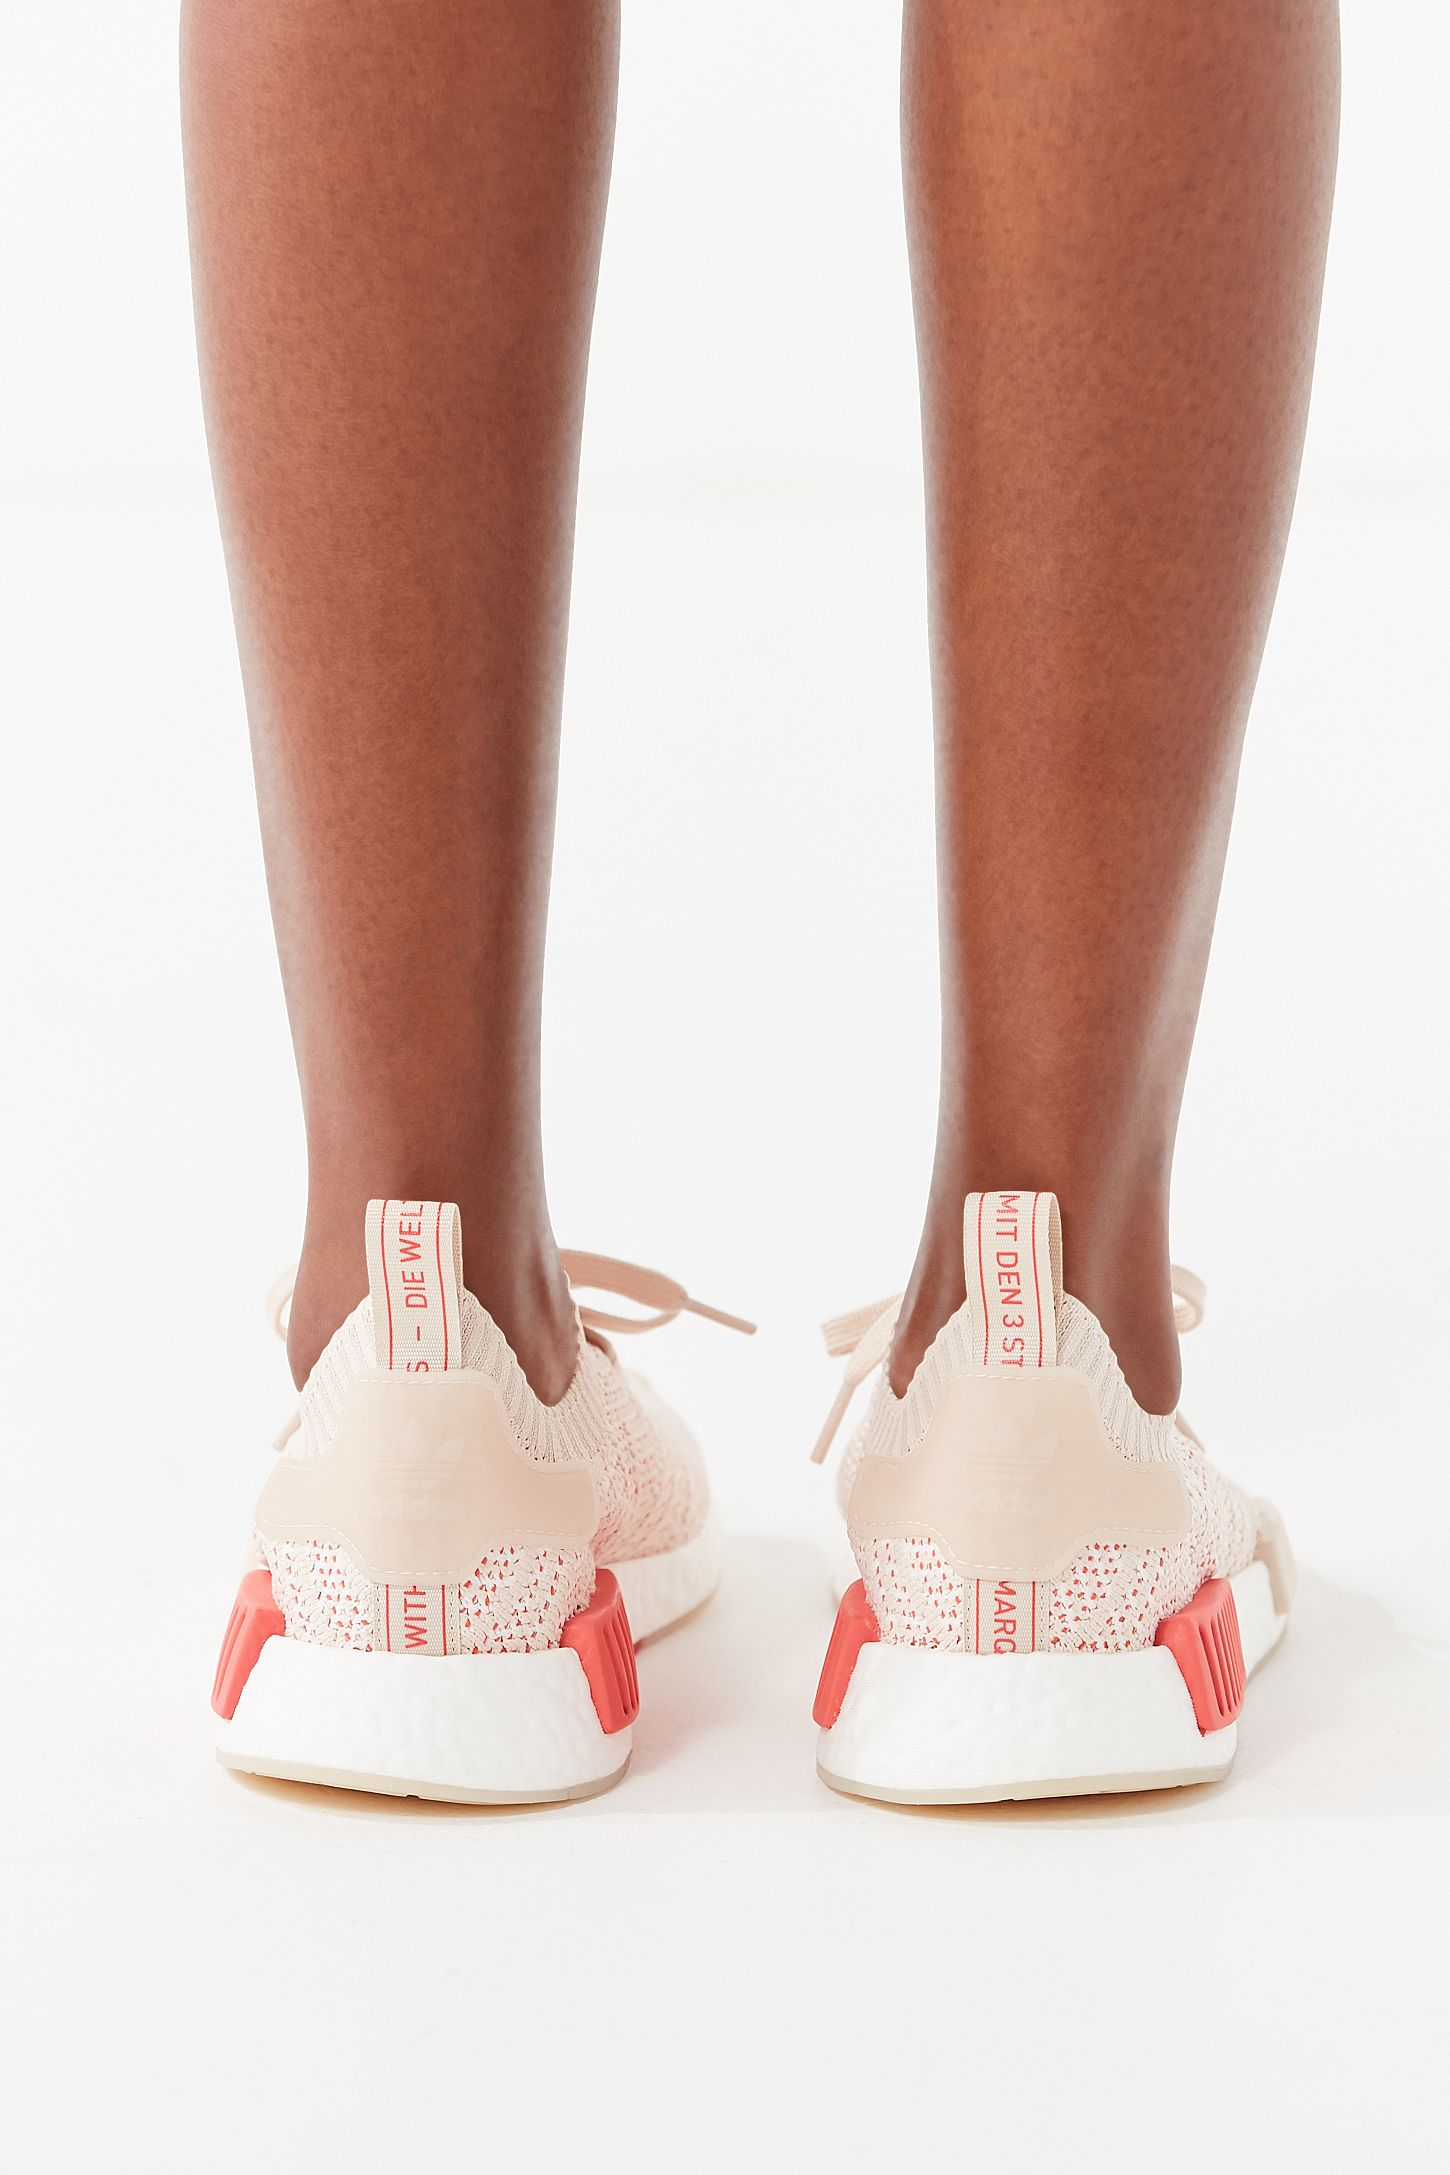 adidas Originals NMD_R1 STLT Primeknit sneakers Bu5f0kox84